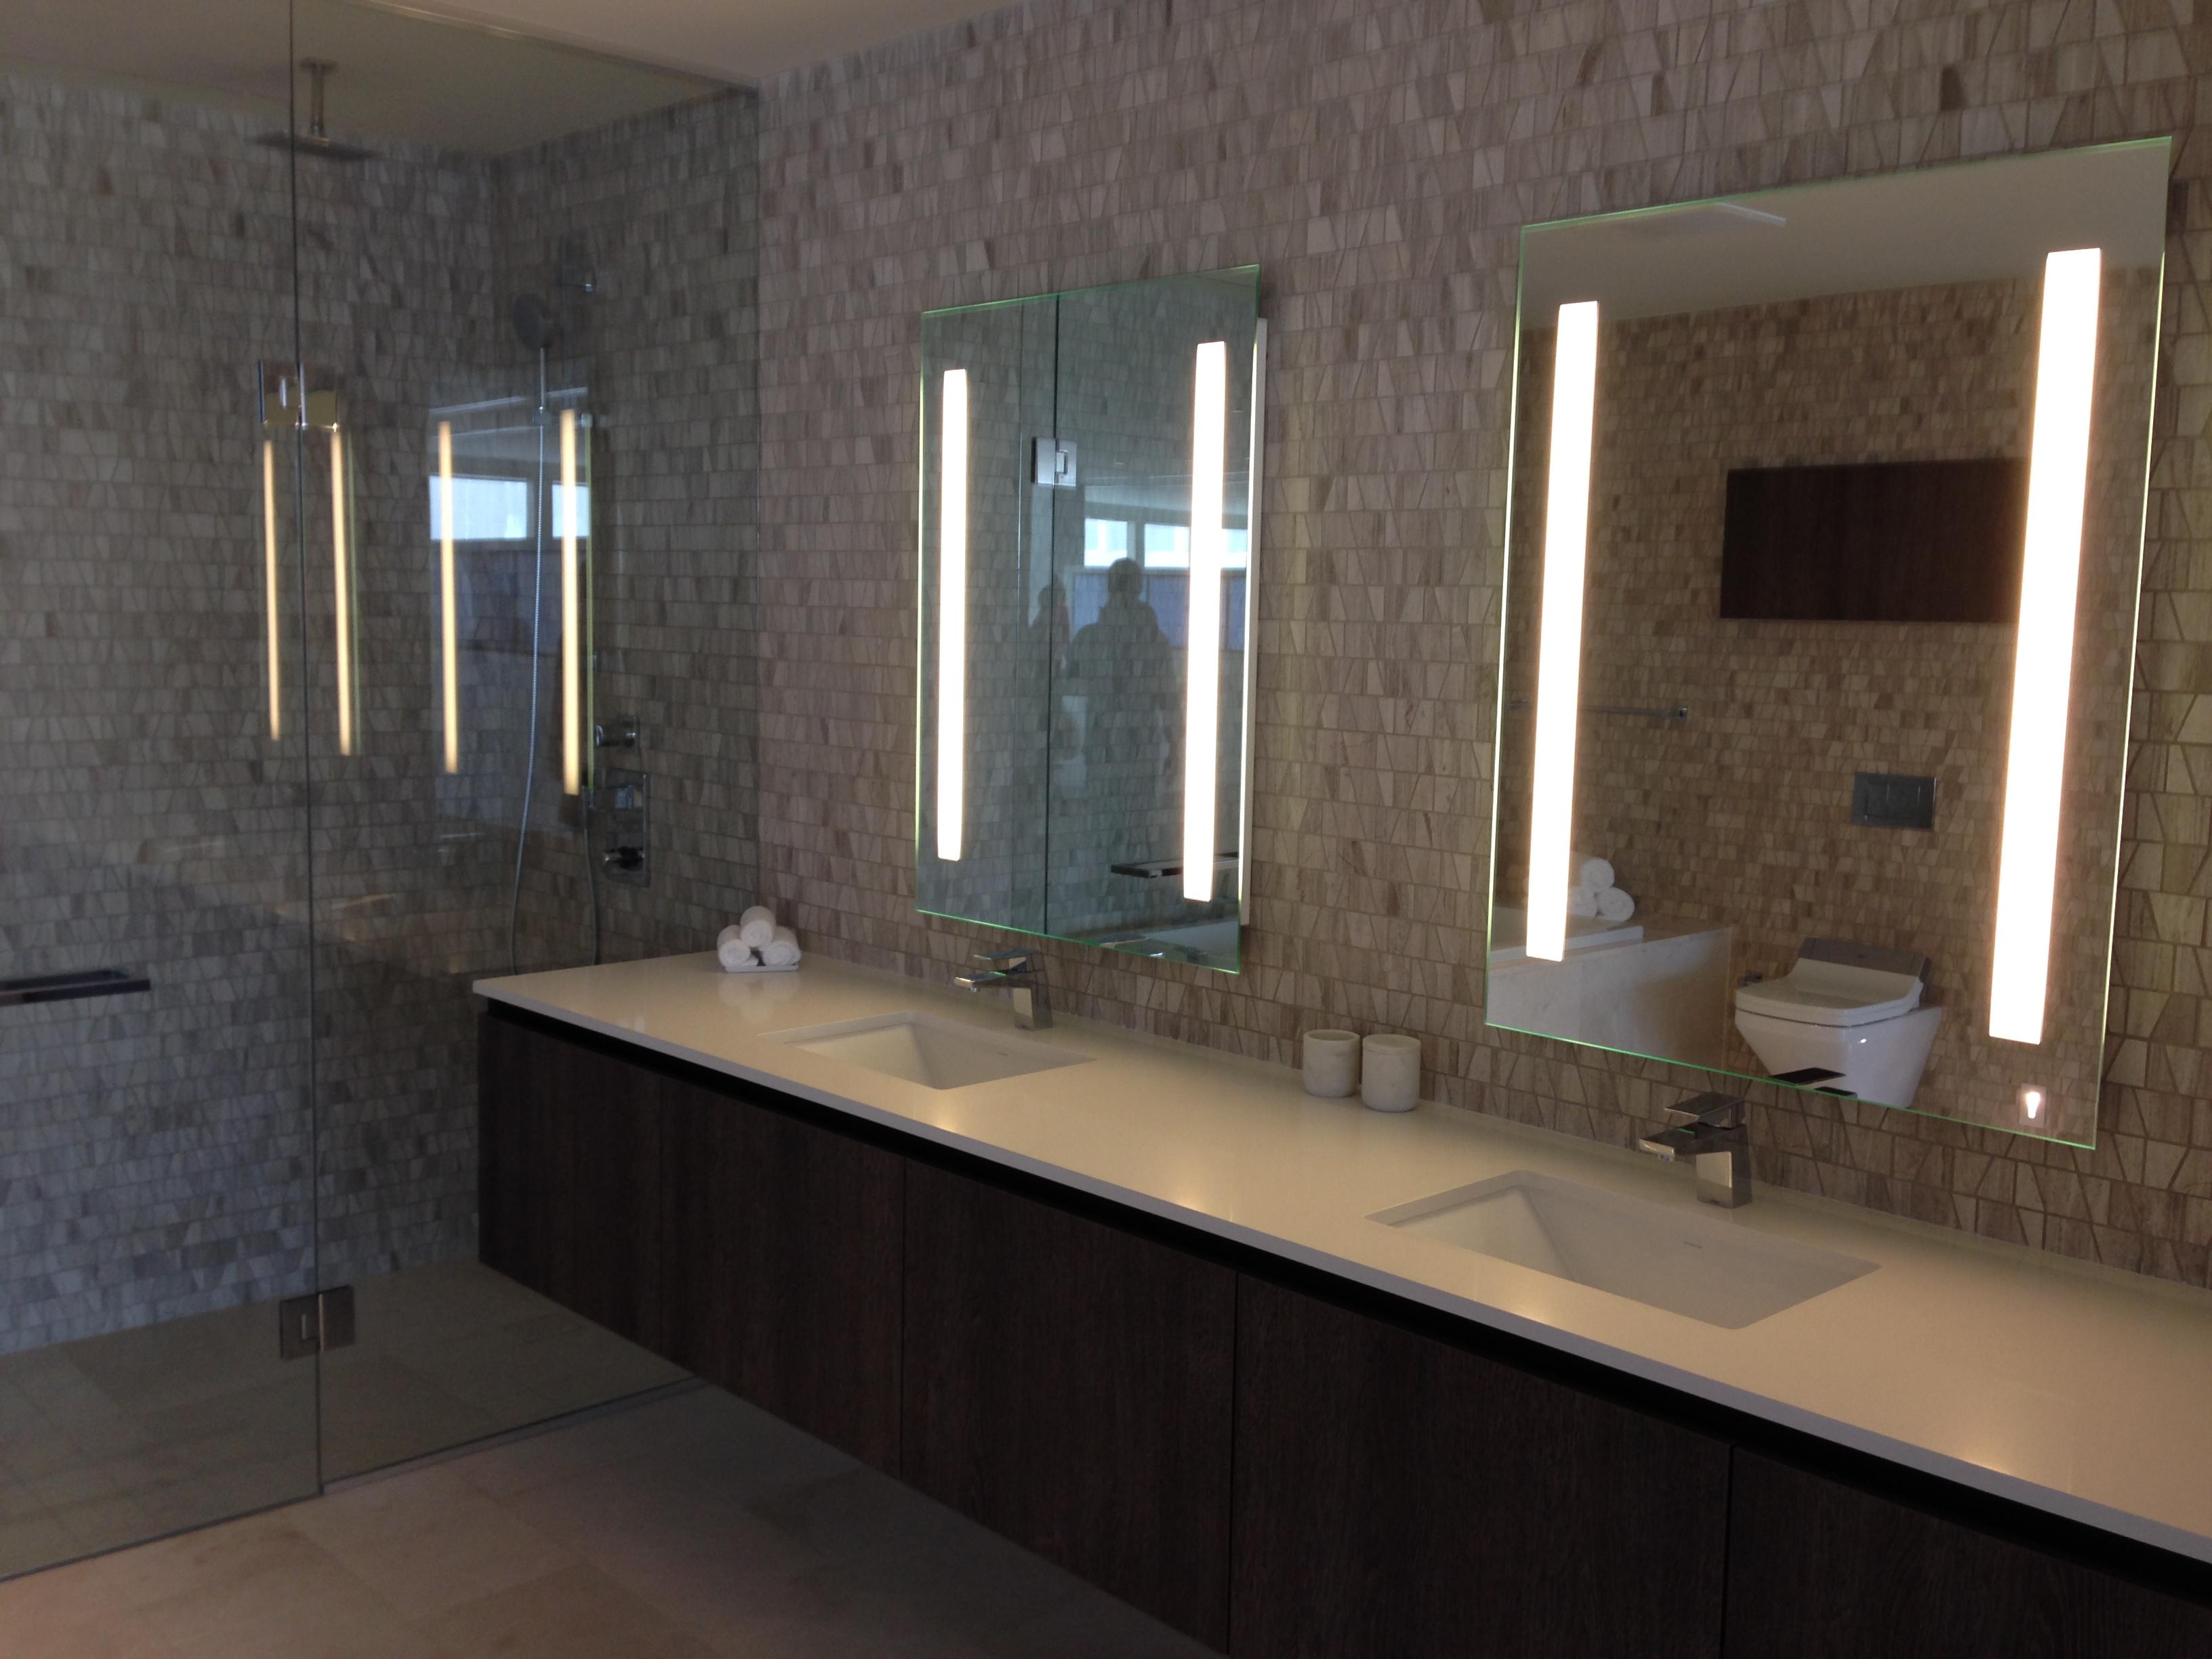 Bathroom Vanity Lights Miami architecture – lindsay loves miami